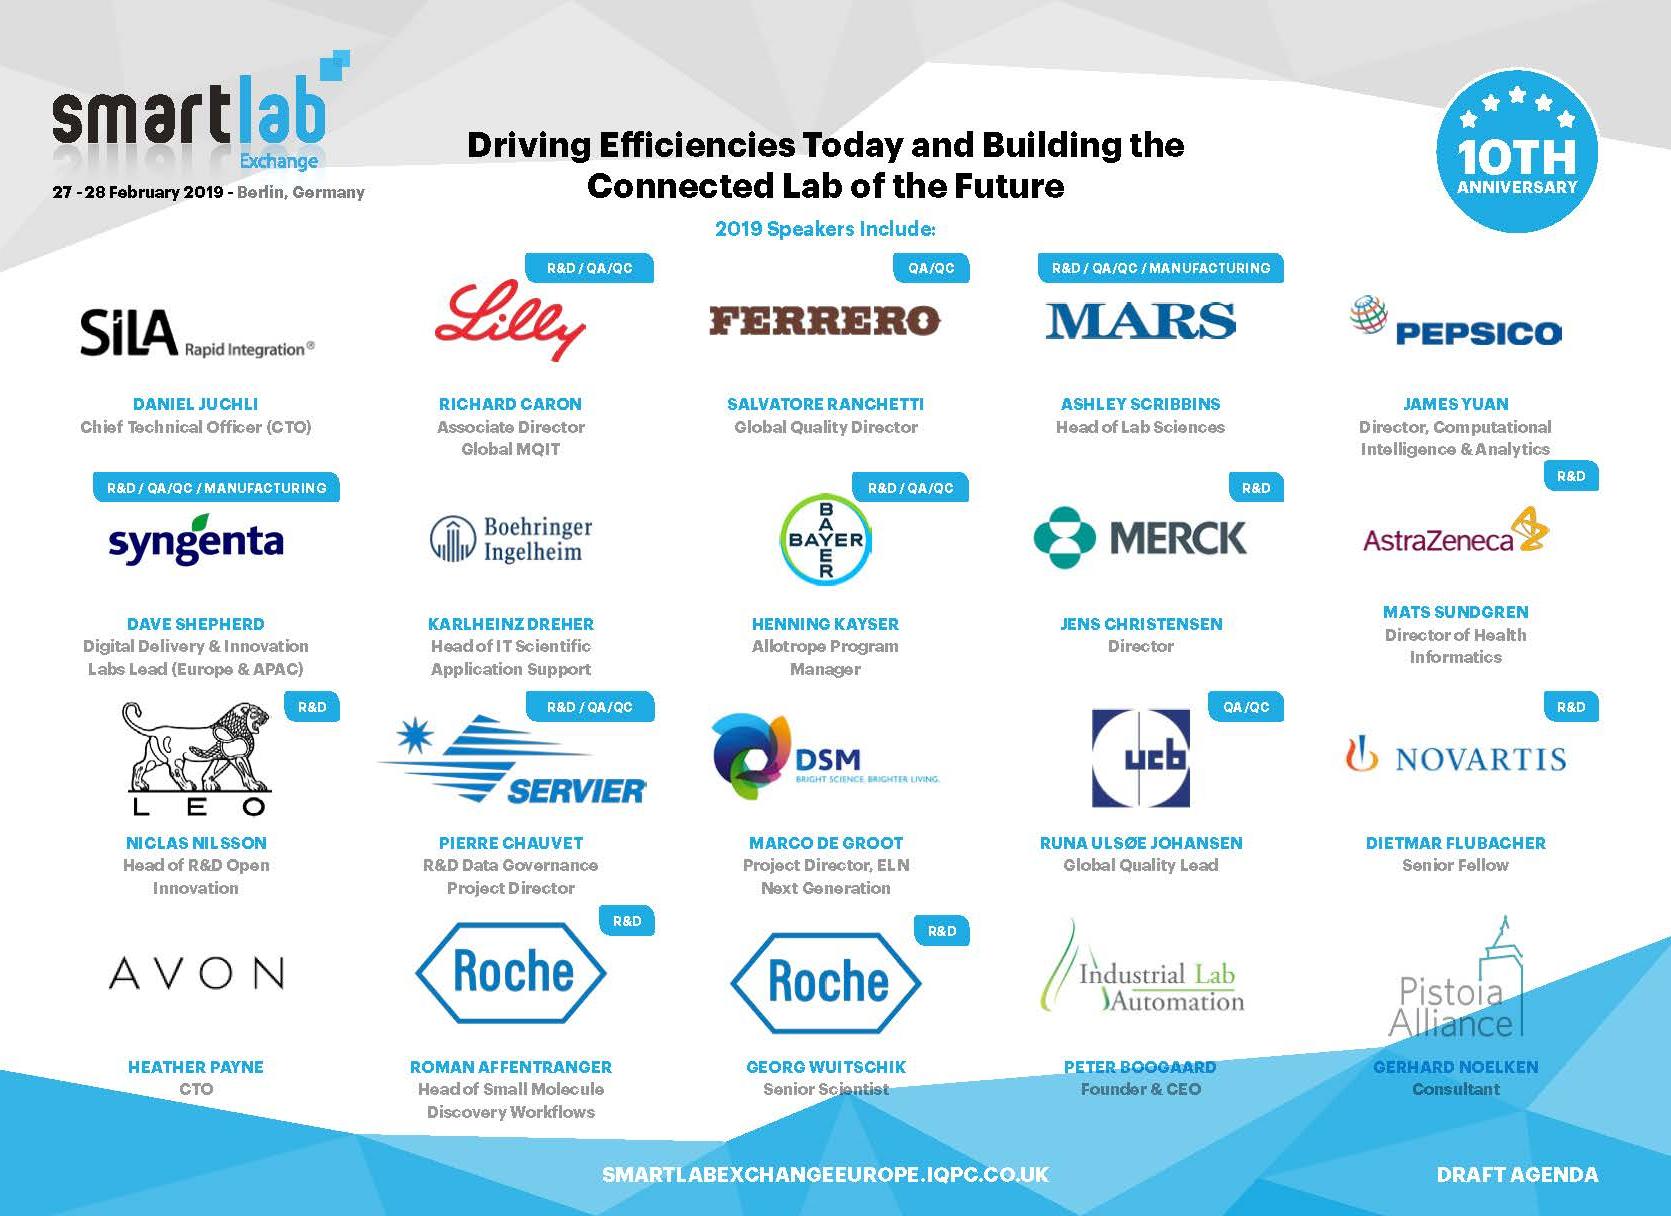 Download the Exclusive 2019 Smartlab Exchange Agenda